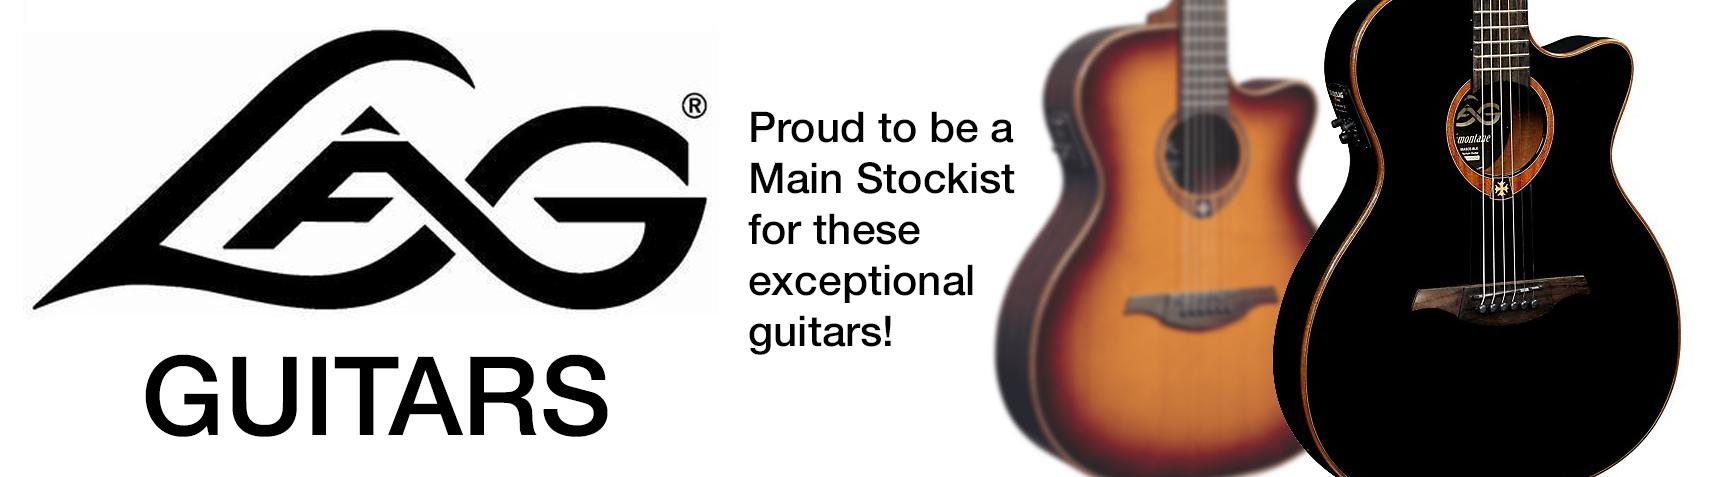 lag guitars main stockist at pencerdd music store